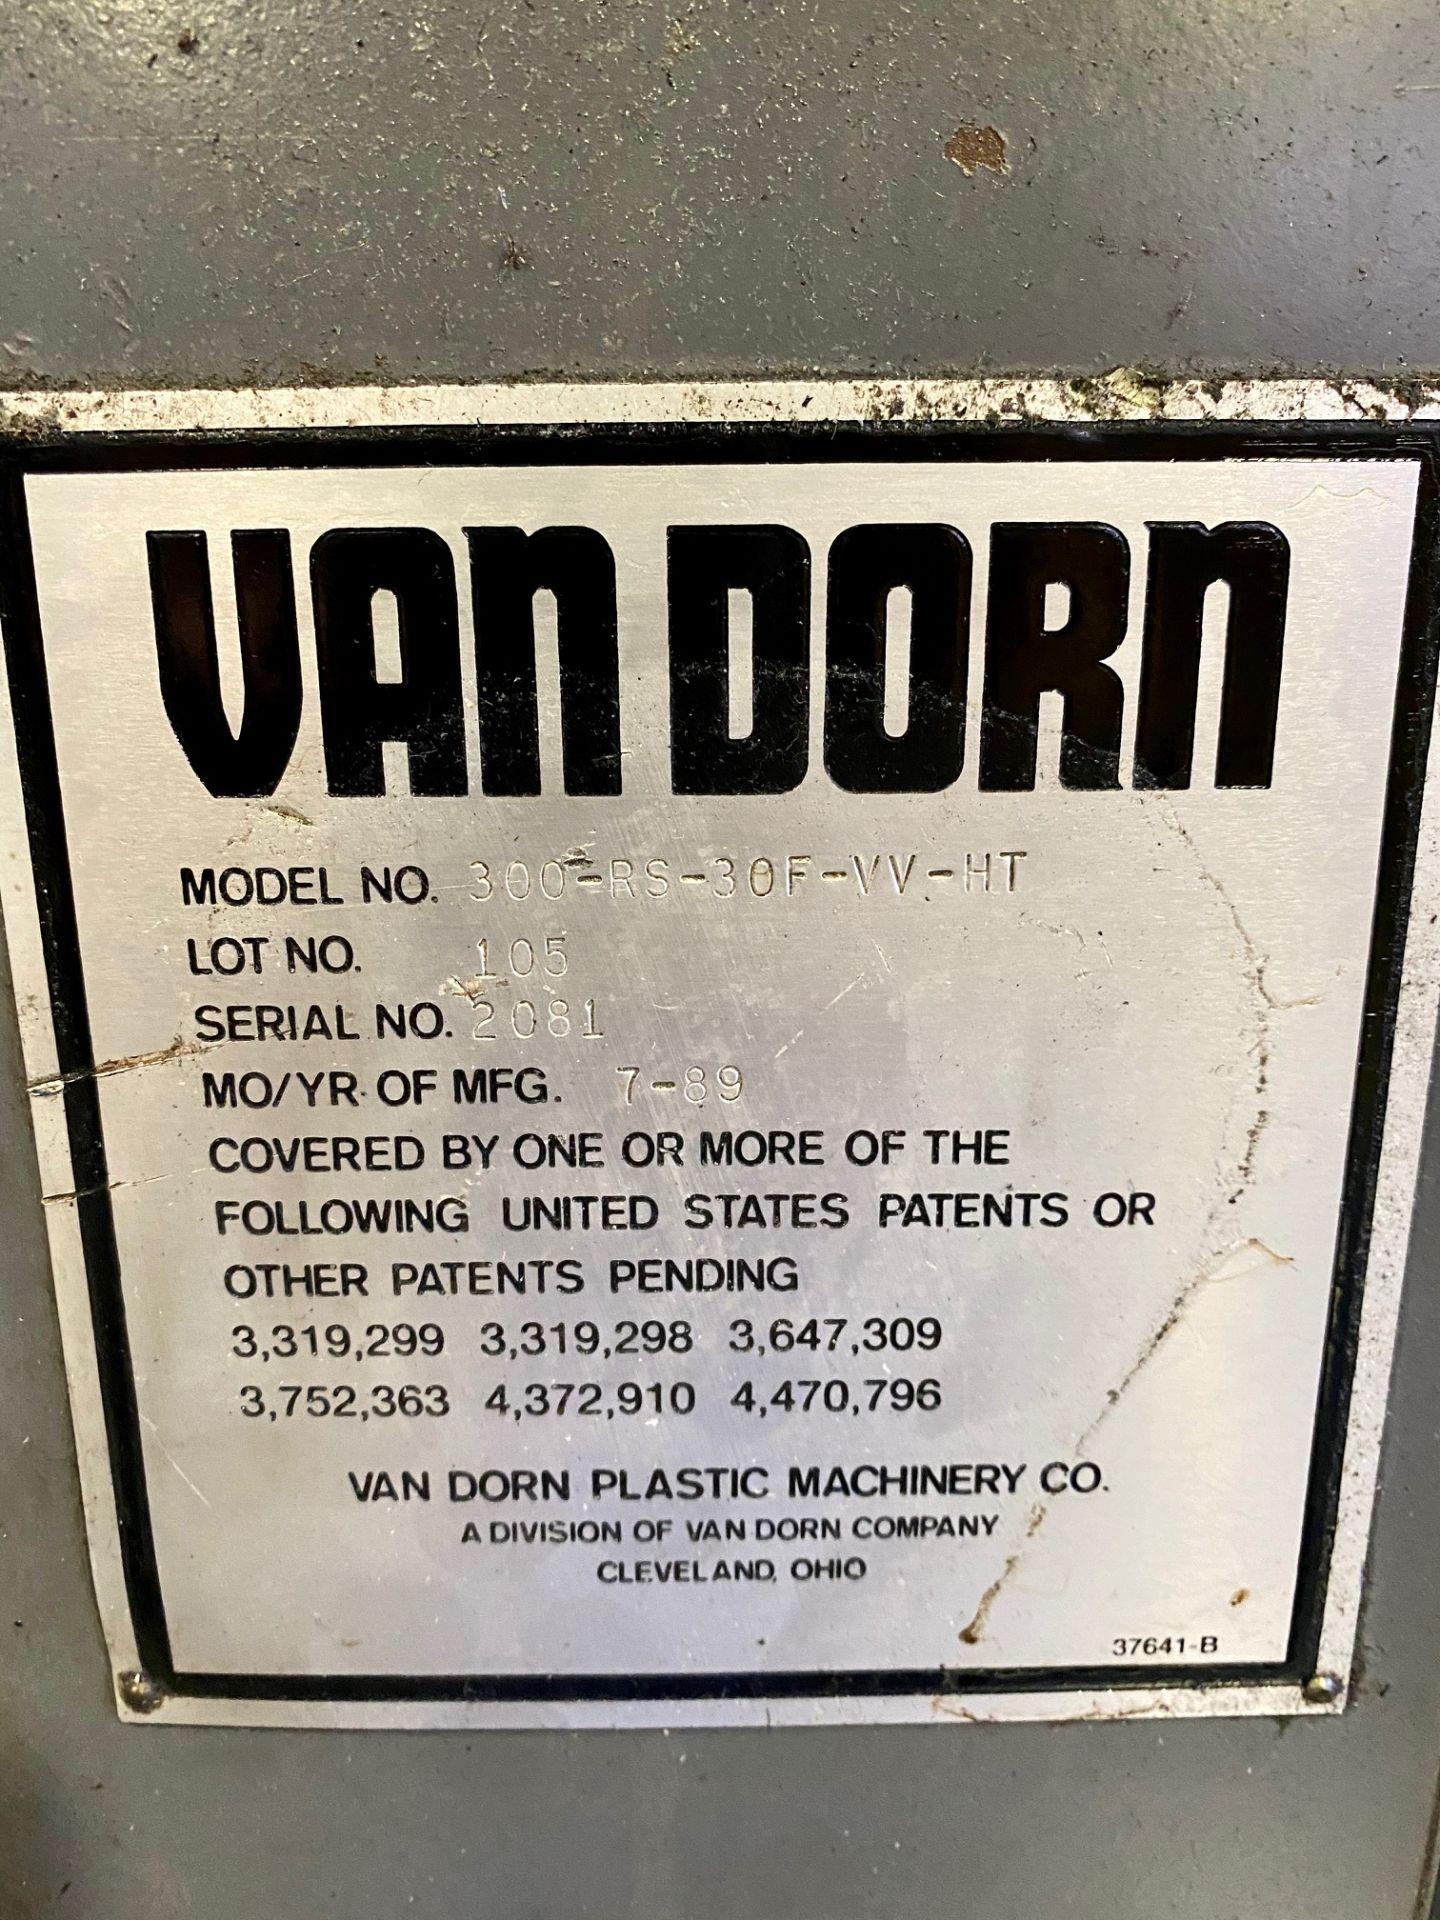 Lot 8 - 1989 VAN DORN 300 TON, MODEL 300-RS-30F-VV-HT, PATHFINDER 3000 CONTROL, 30 OZ SHOT SIZE